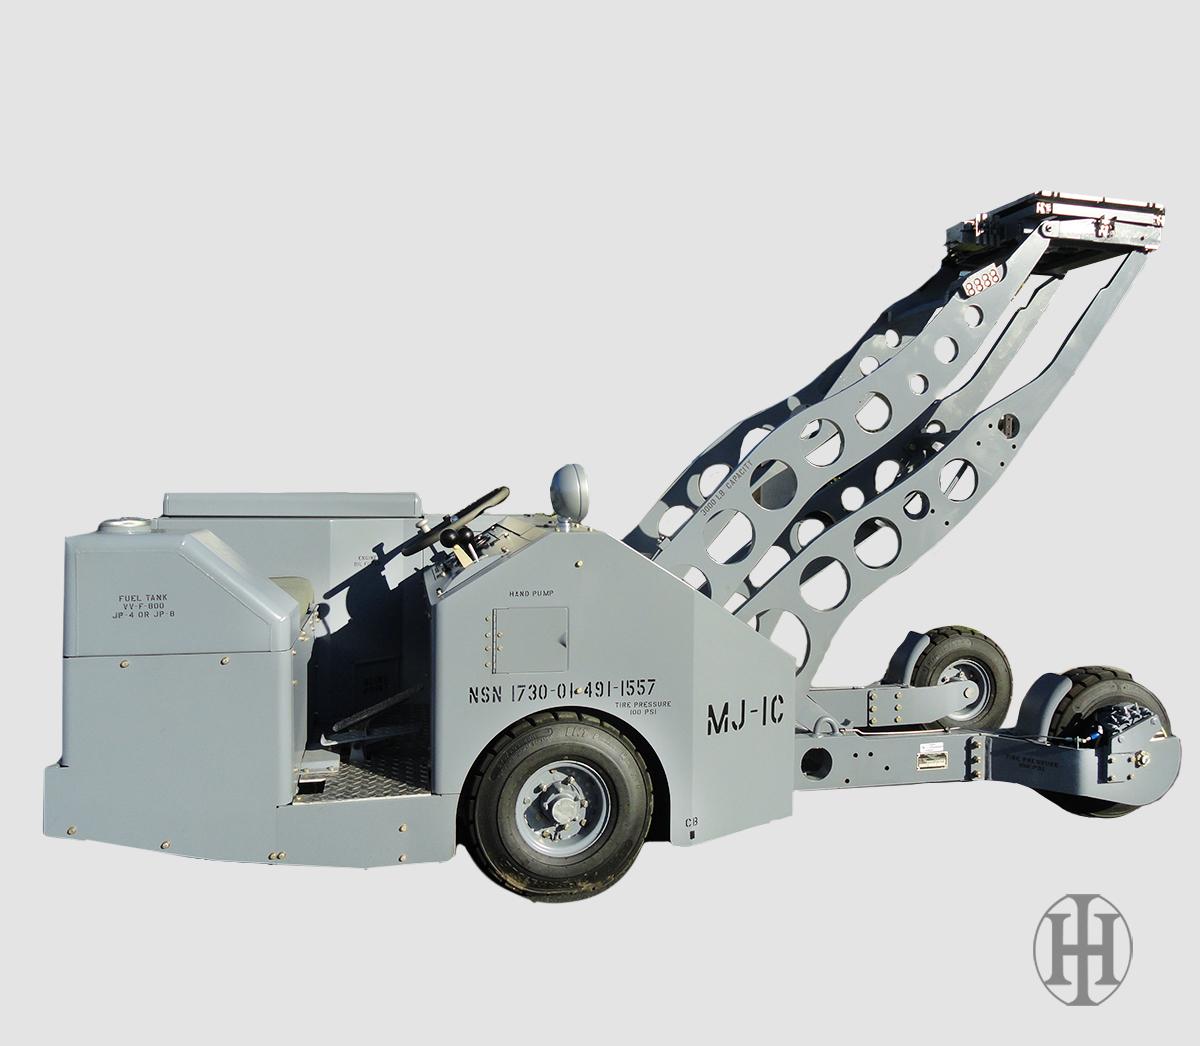 Weapons Loaders Hydraulics International Inc